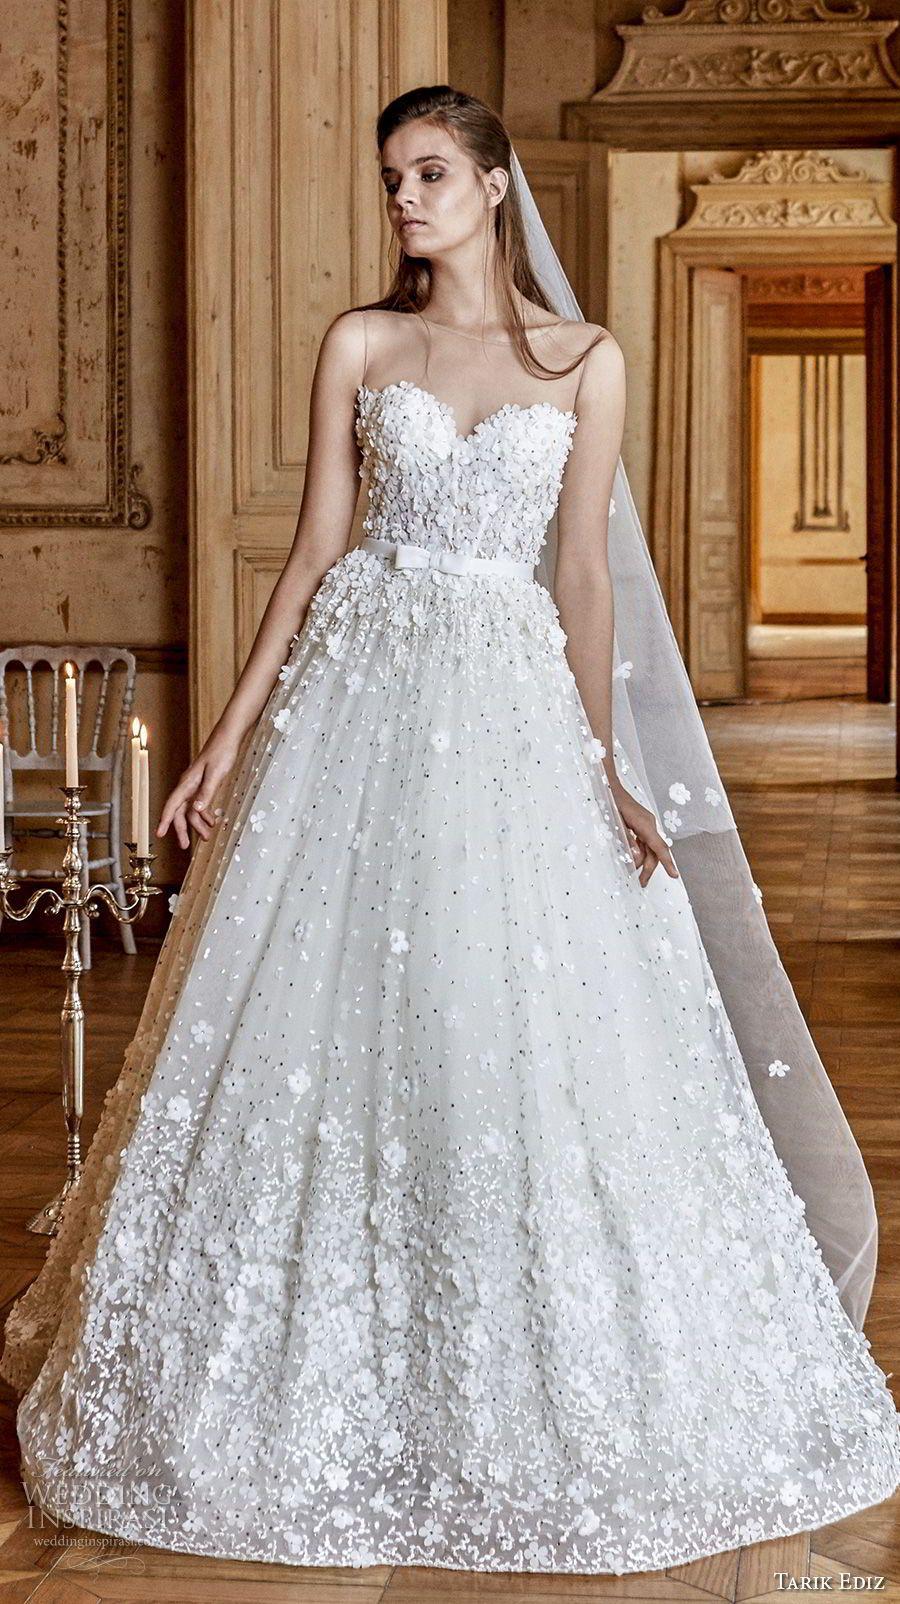 Tarik Ediz White 2017 Wedding Dresses | Wedding dress, Romantic and ...